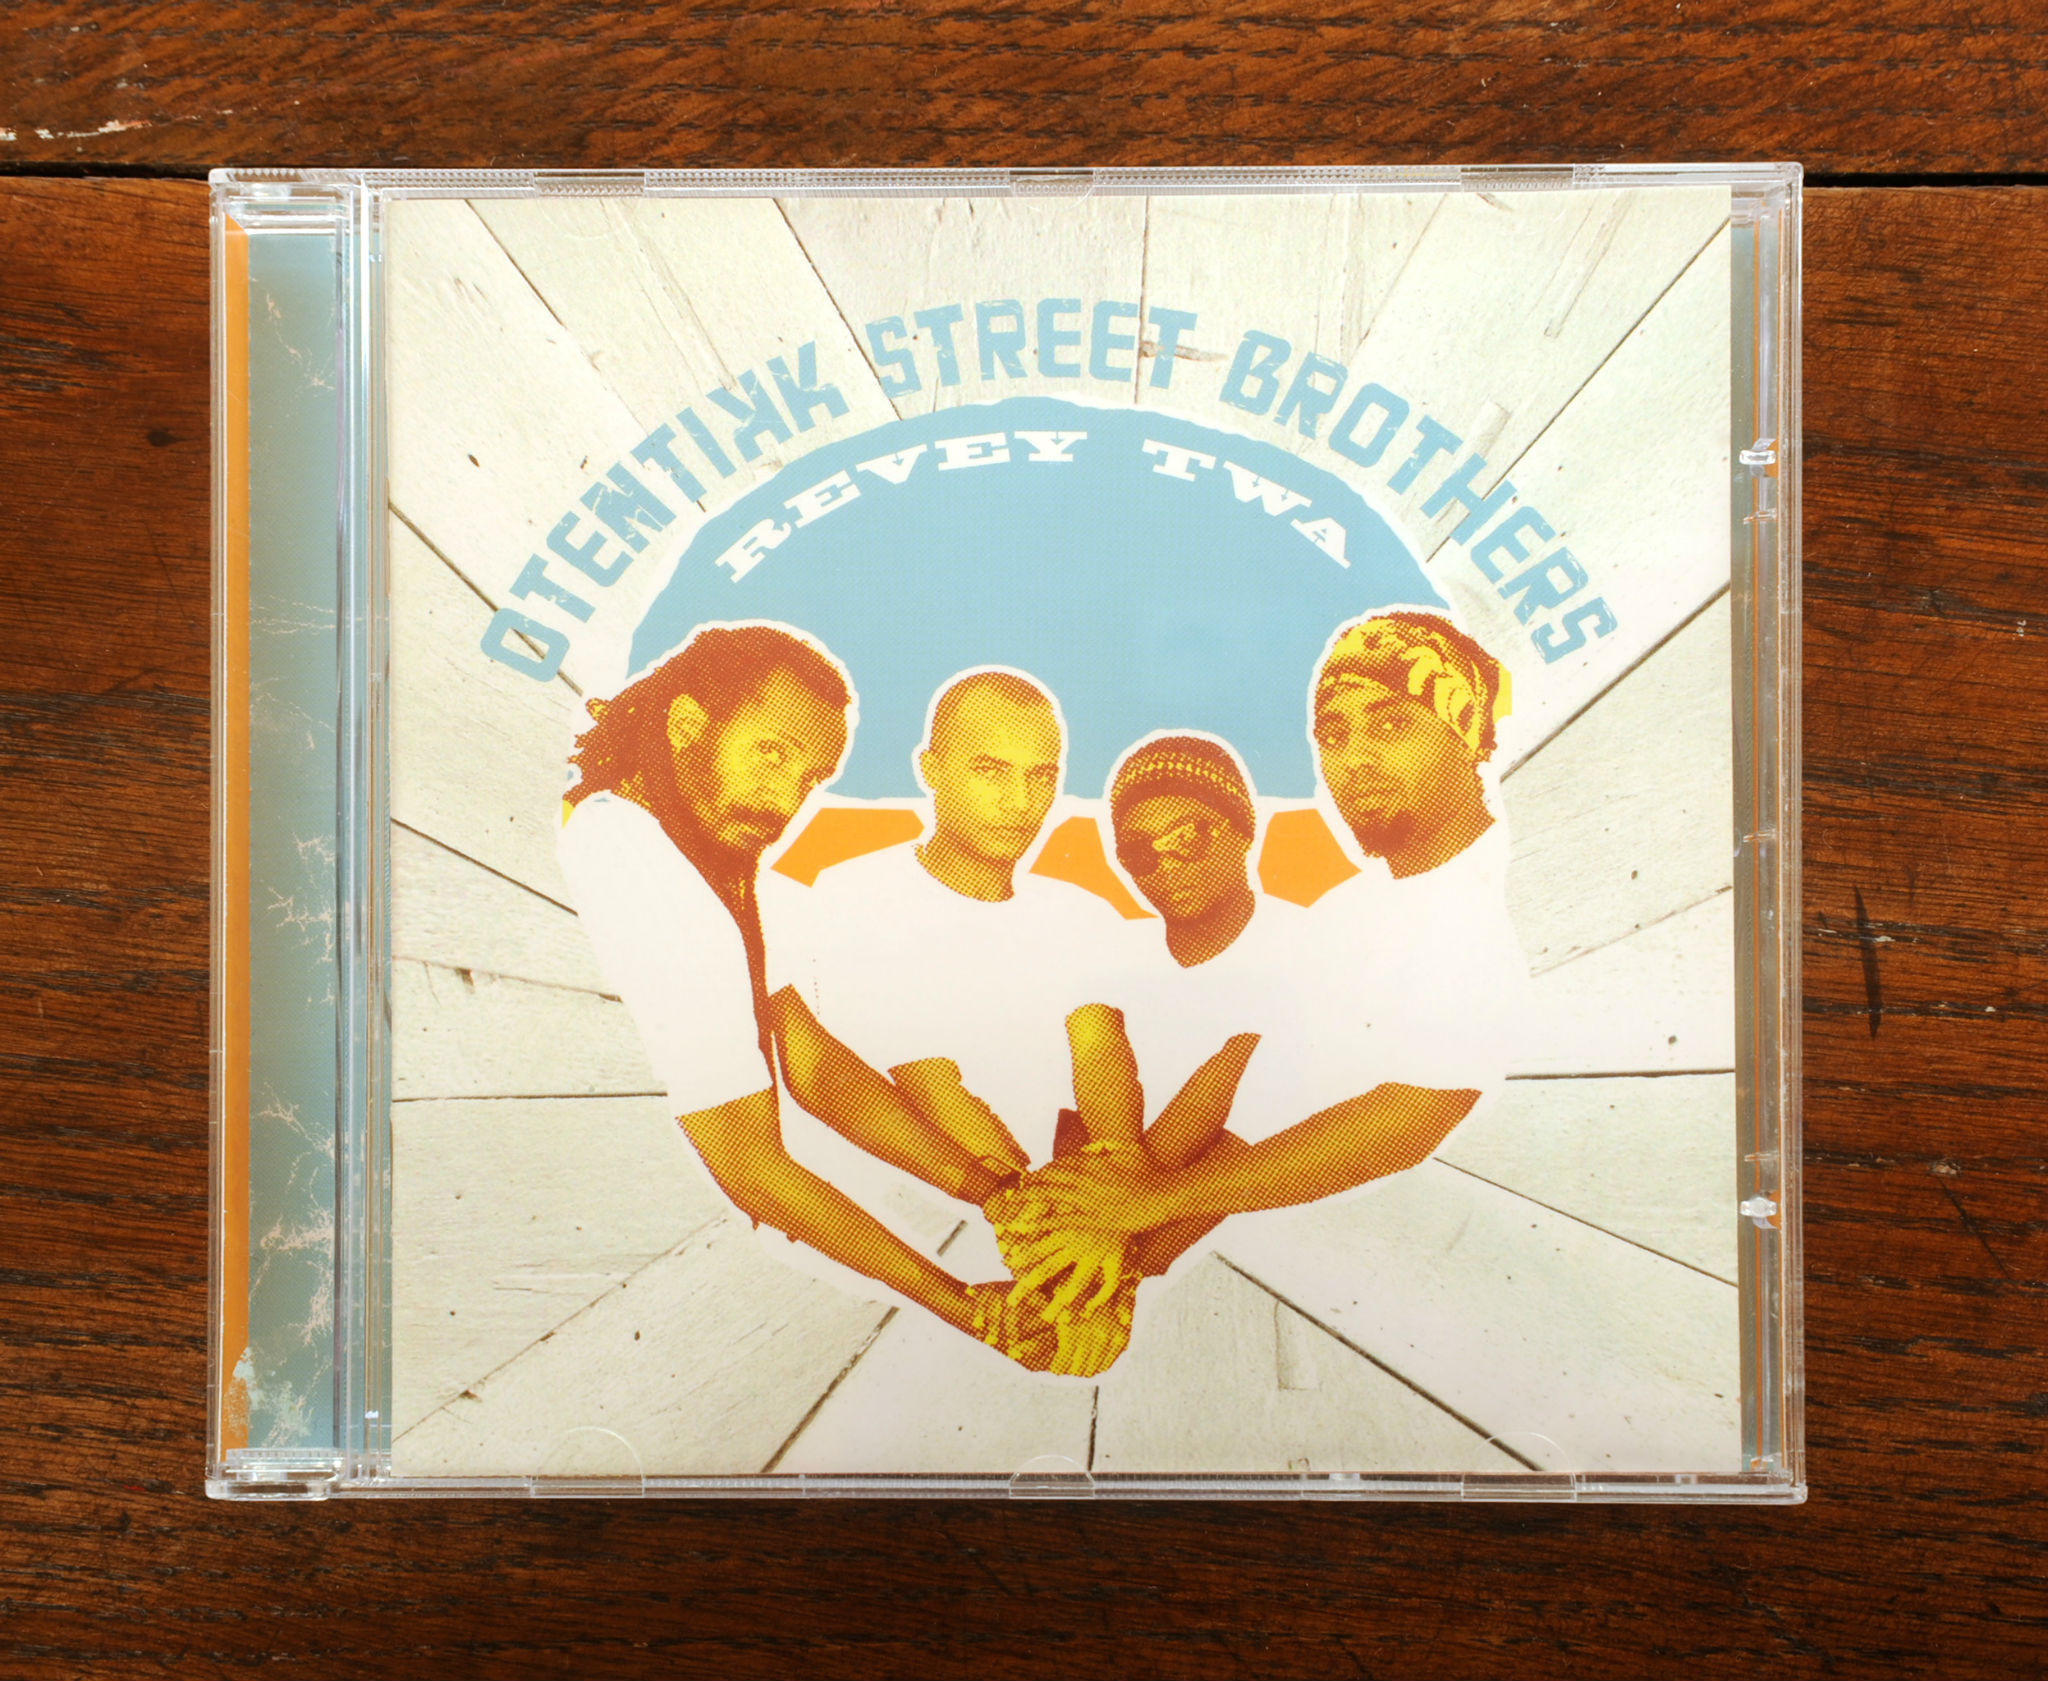 Kleon Medugorac Otentikk Street Brothers – Rewey Twa